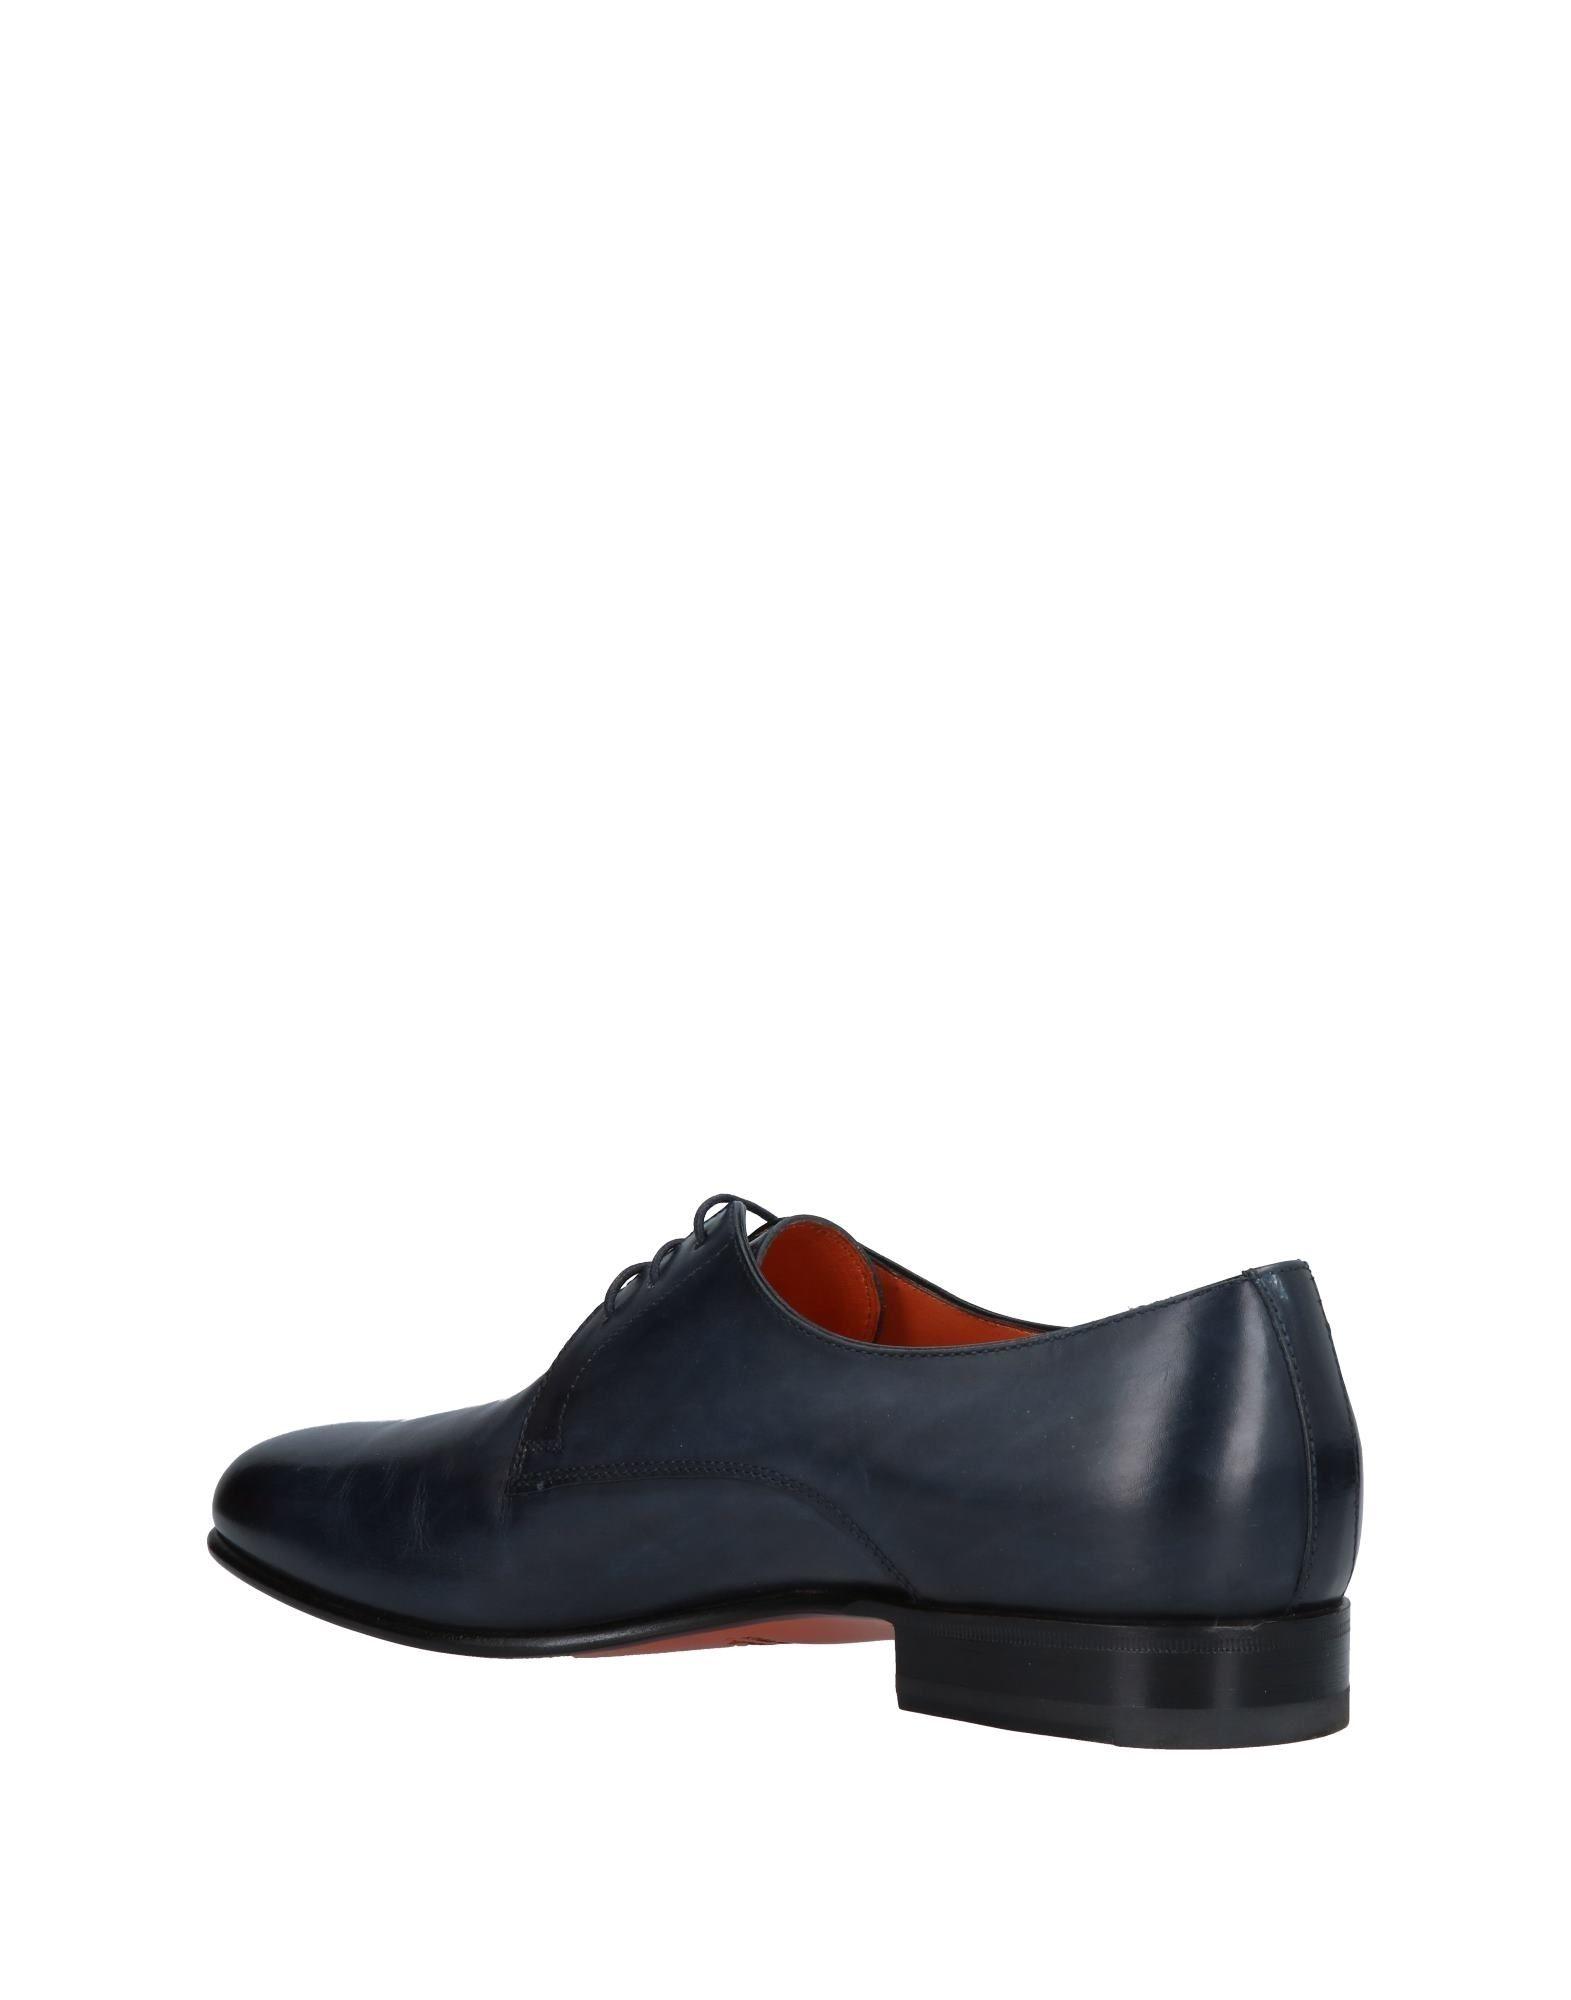 Santoni Heiße Schnürschuhe Herren  11411113JA Heiße Santoni Schuhe ae98d8